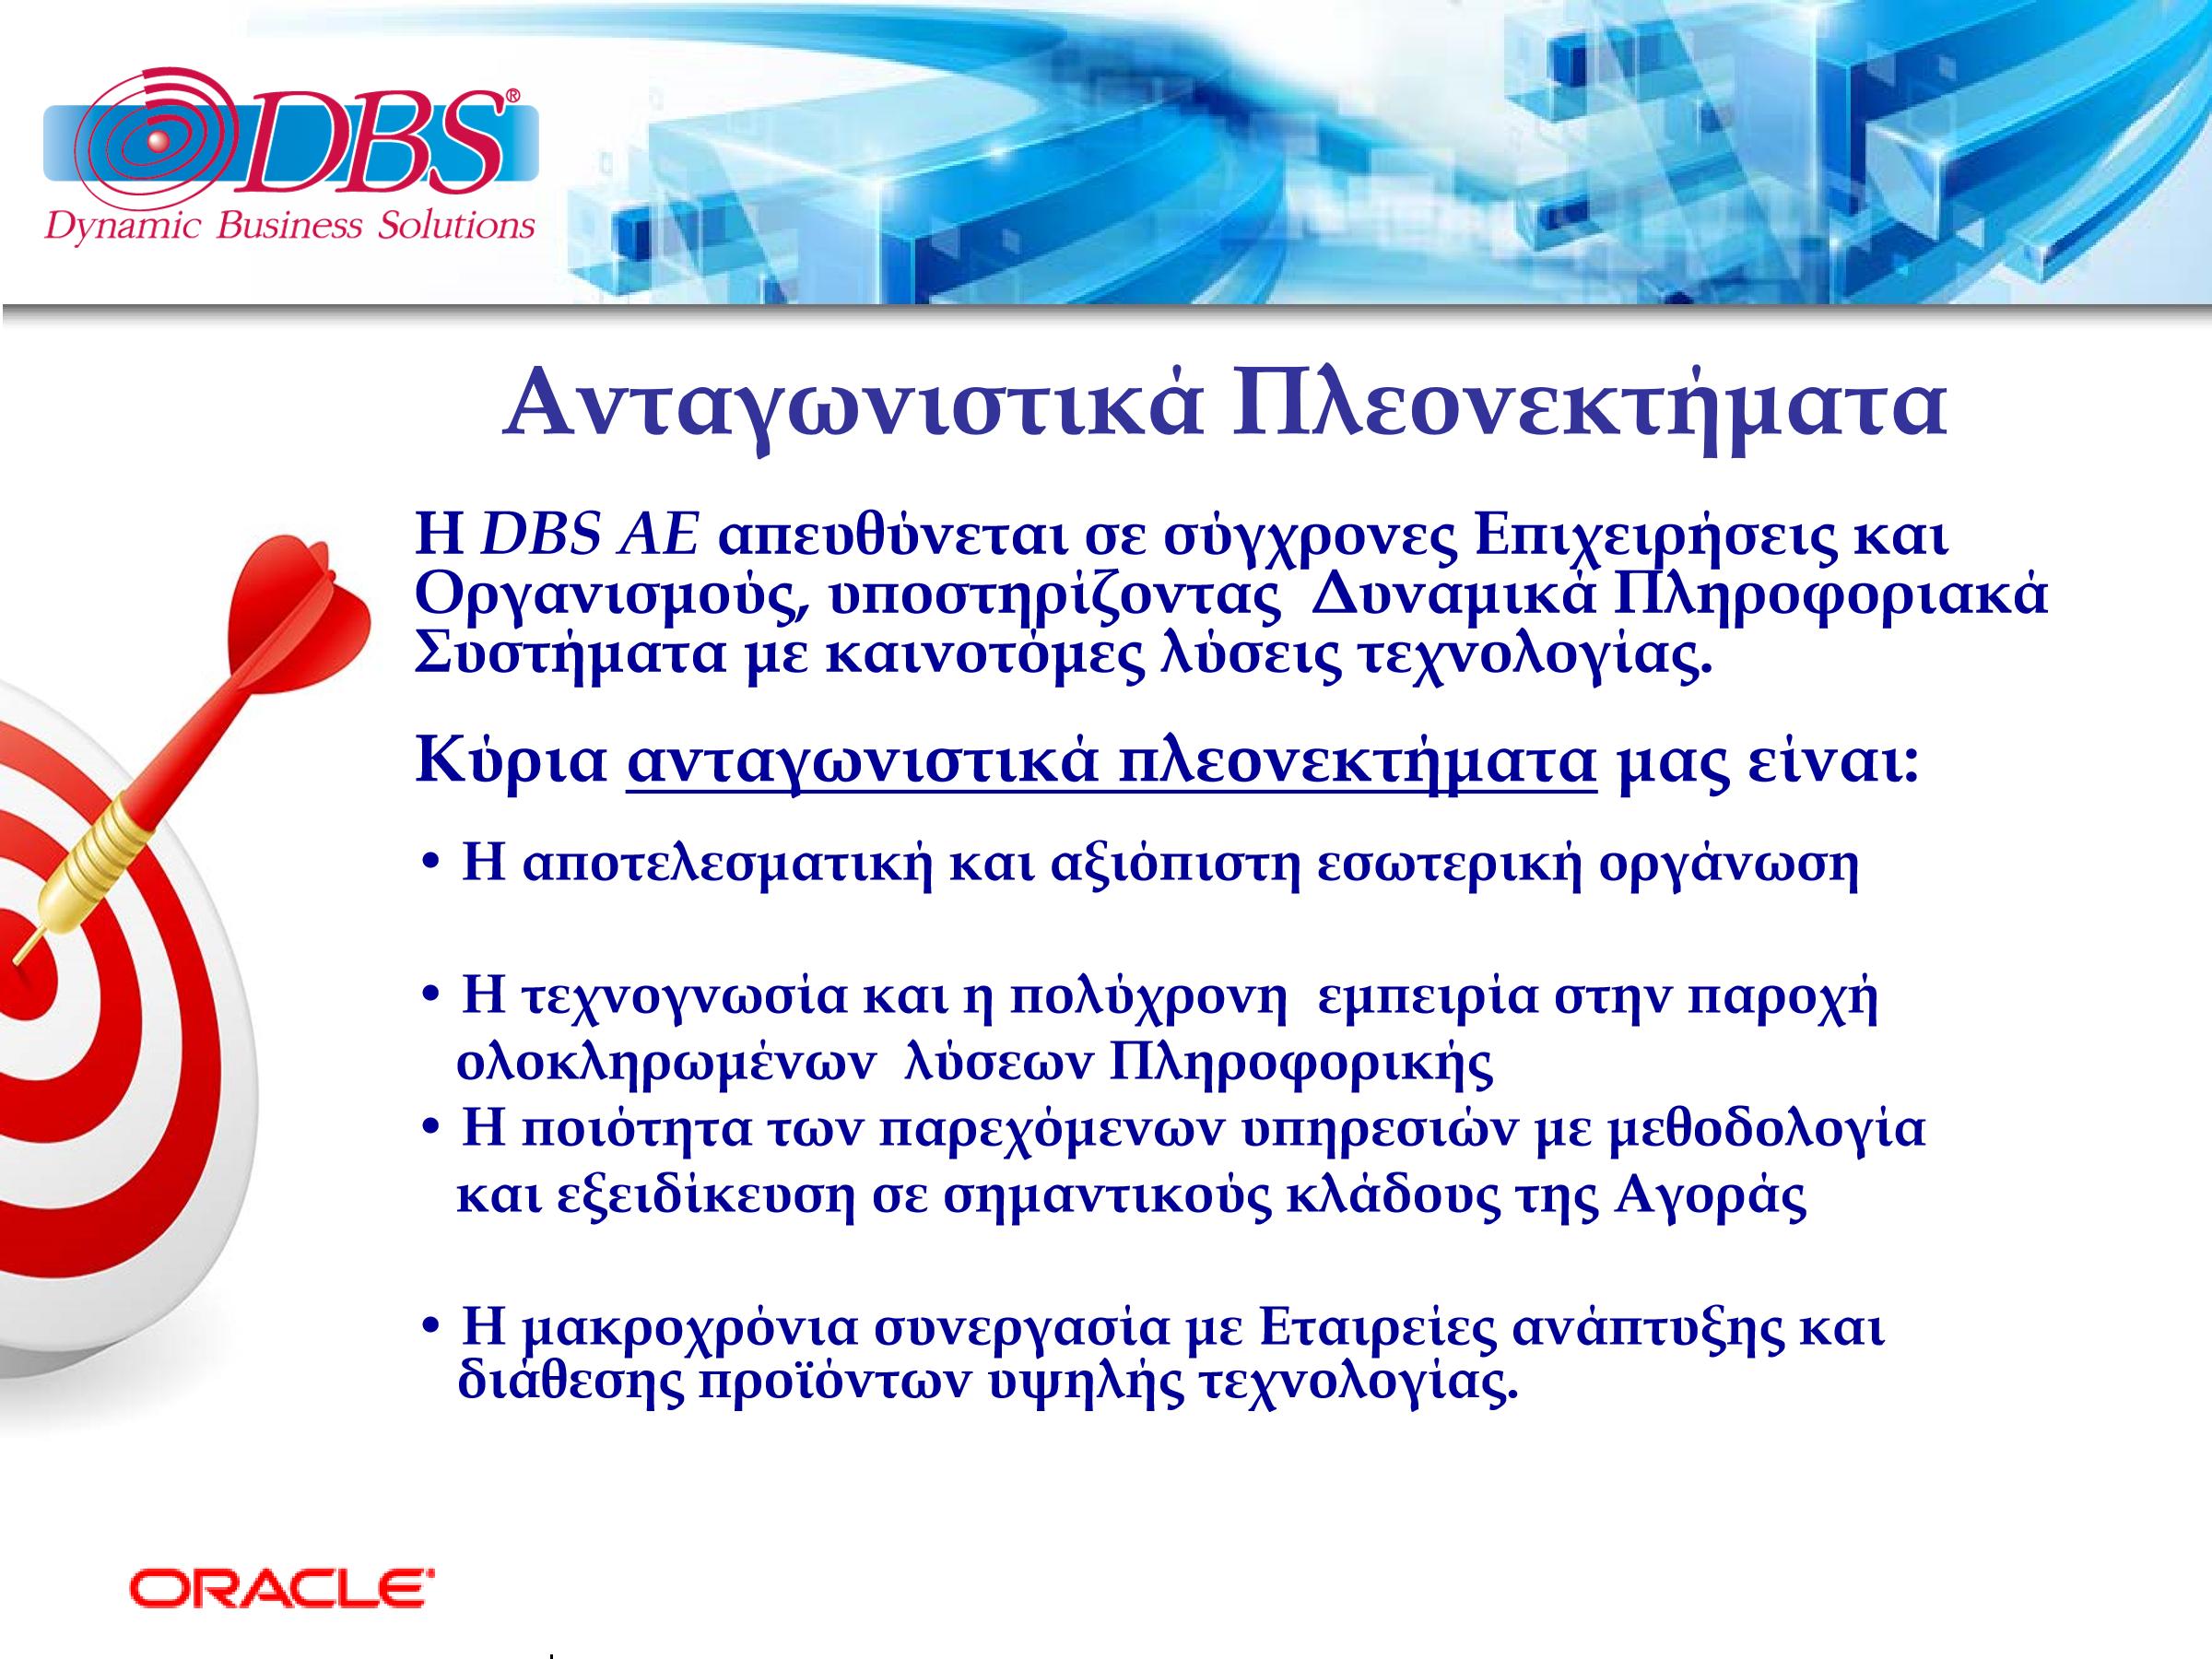 DBSDEMO2019_COMPANY_PROFILE_V18_R26FB-EL-4